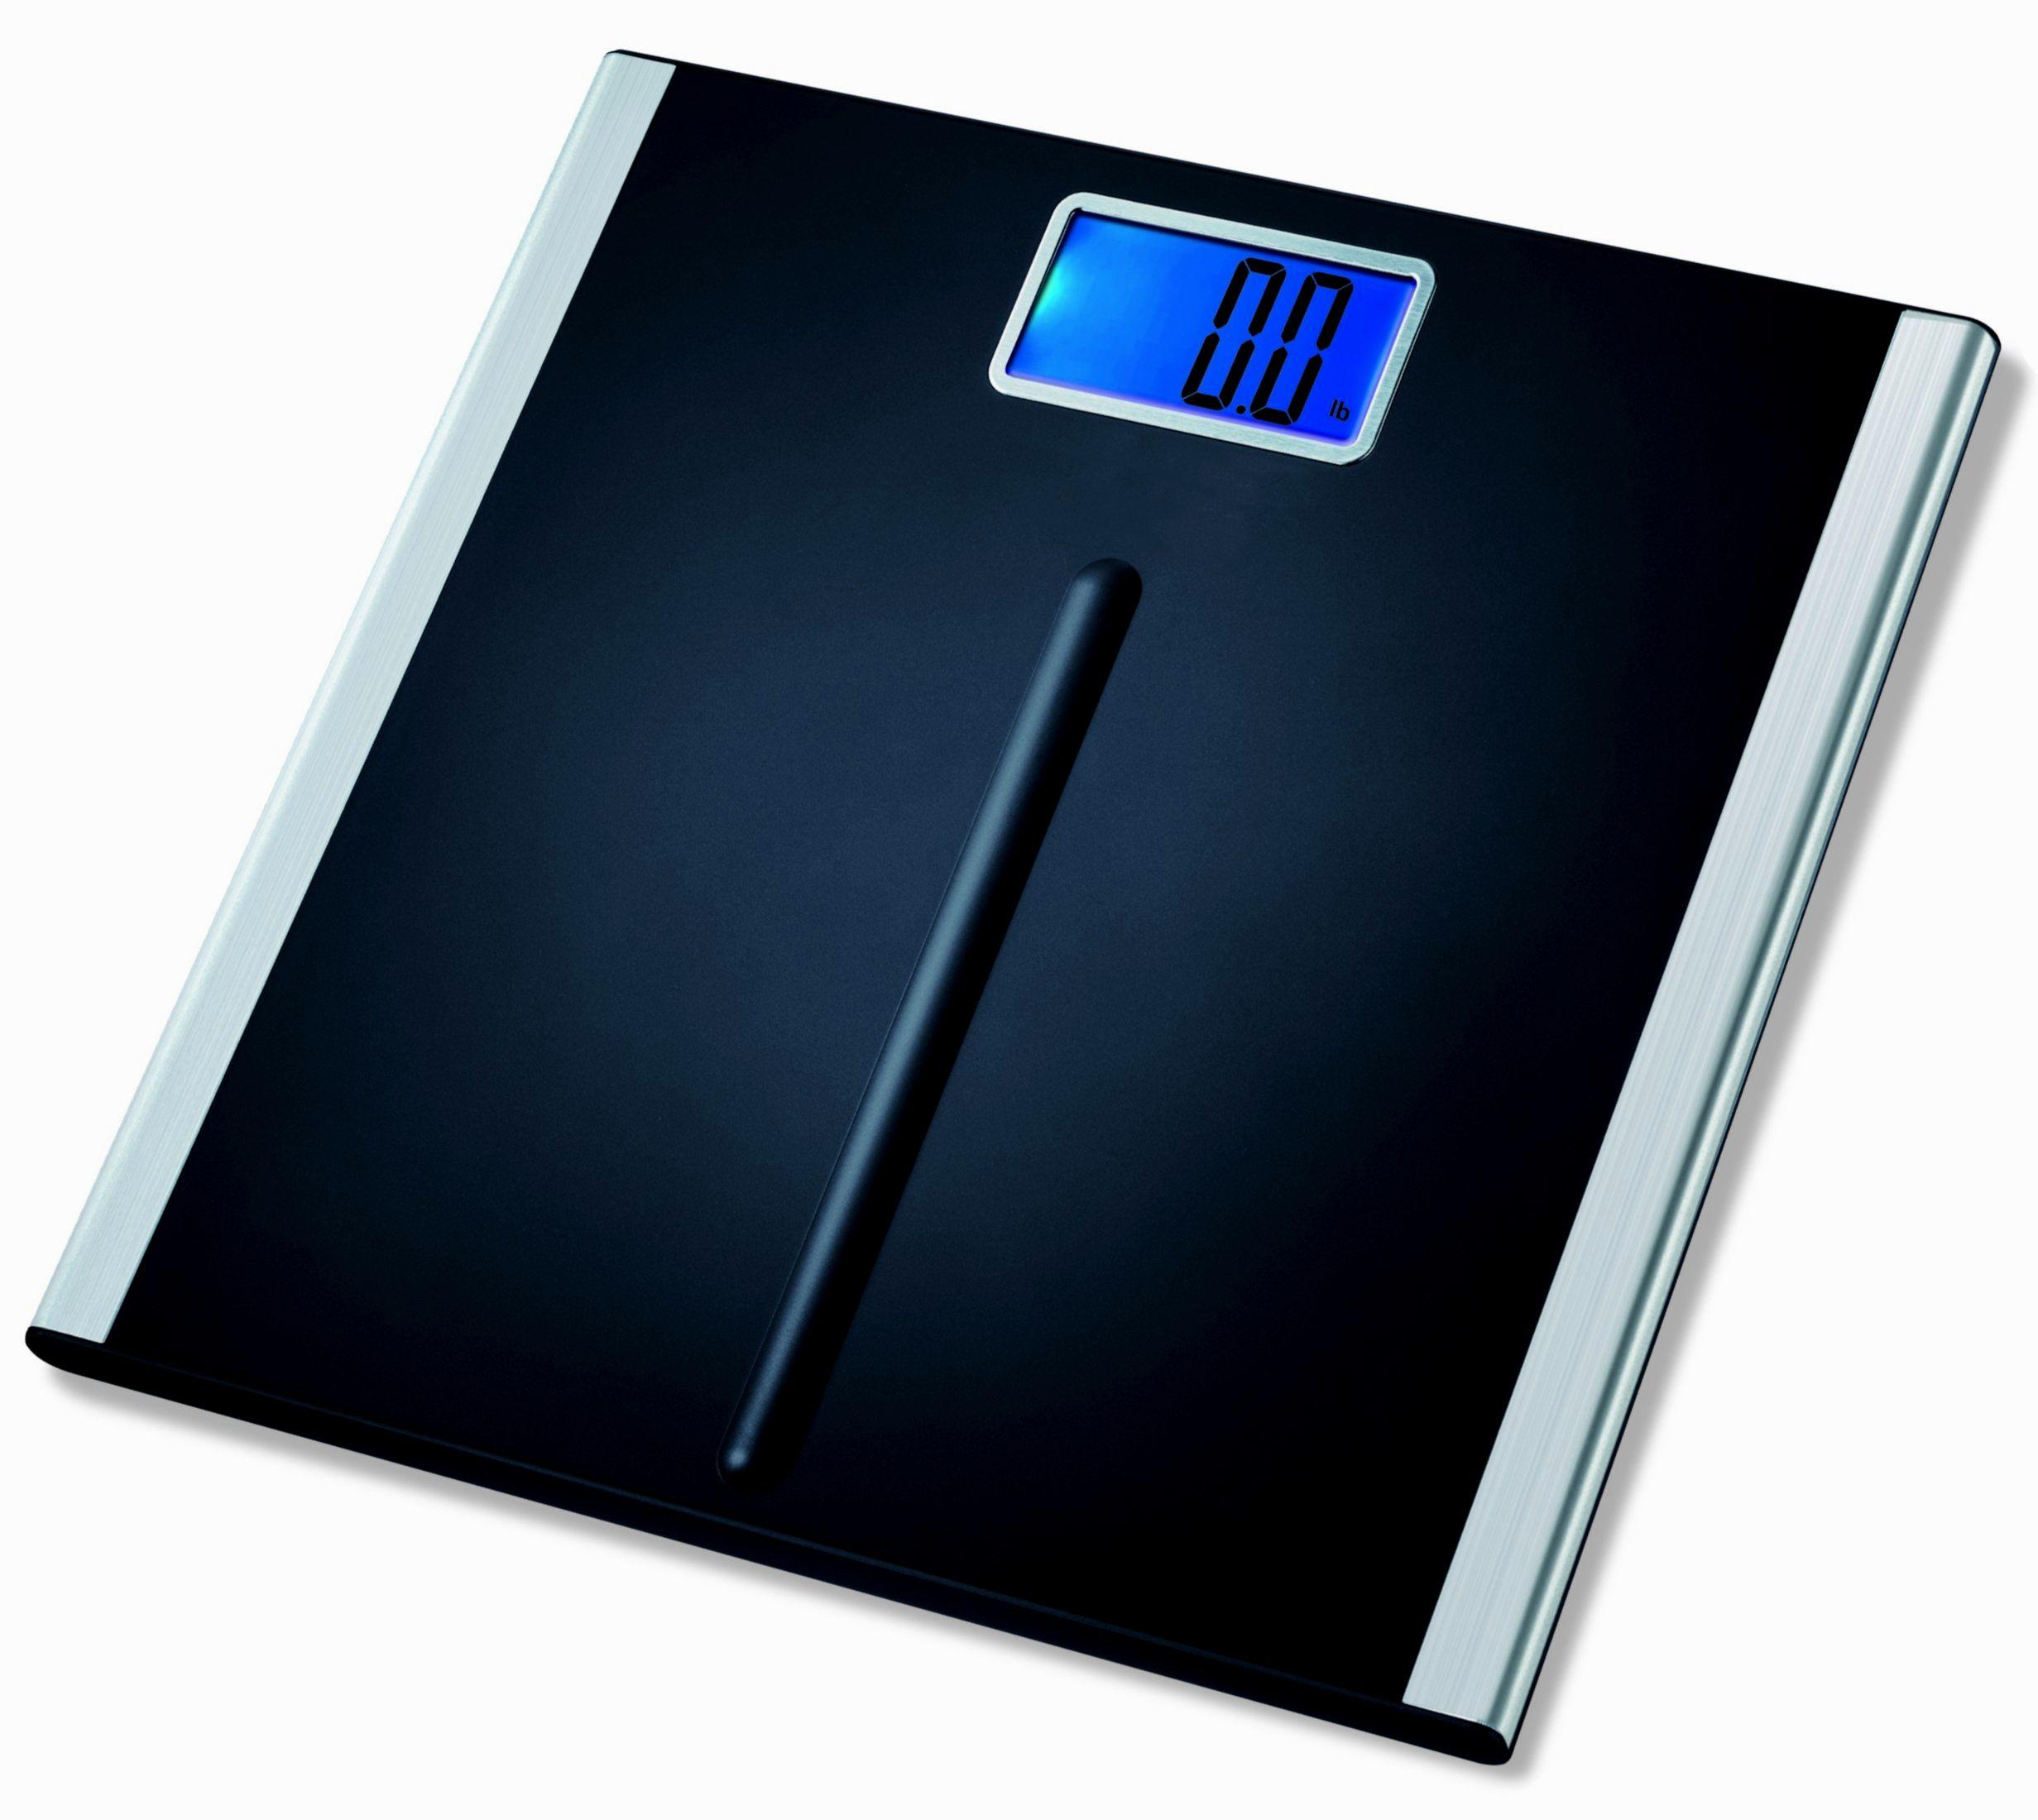 best eatsmart precision digital bathroom scale gallery-Stunning Eatsmart Precision Digital Bathroom Scale Gallery